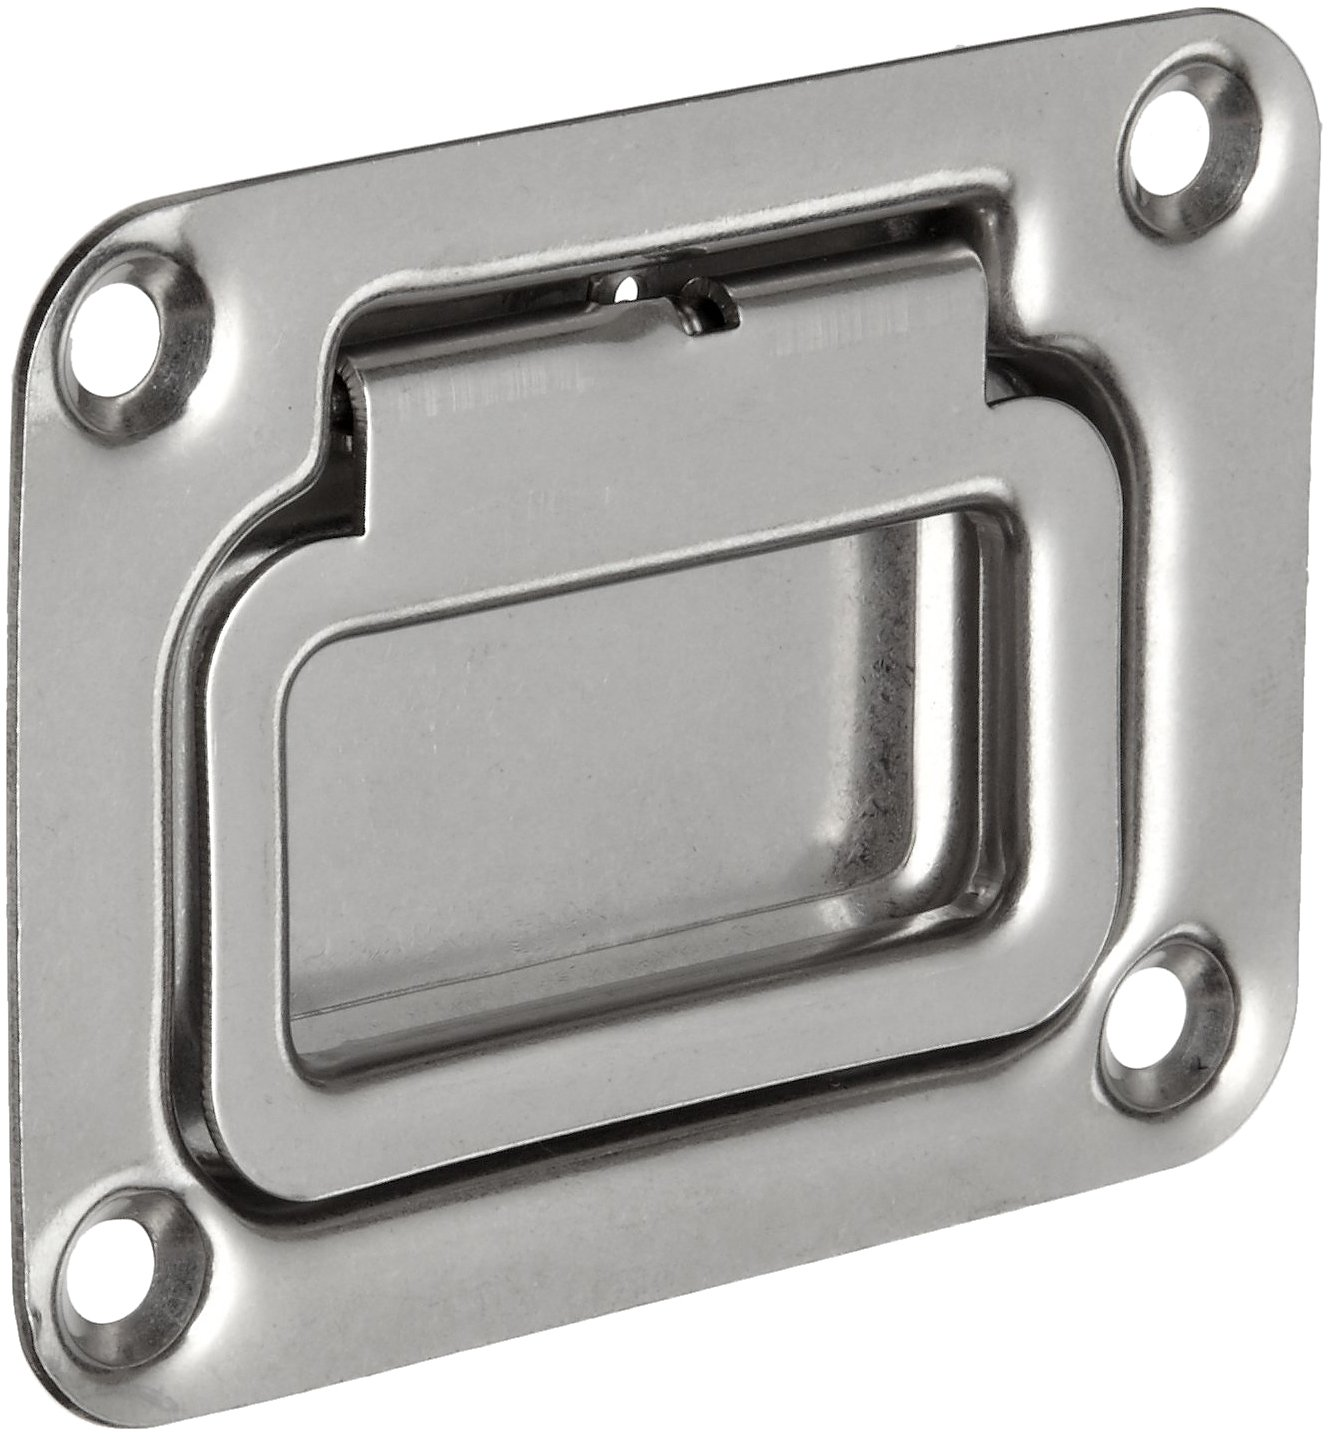 Monroe Stainless Steel 304 Recessed Spring Loaded Pull Handle ...